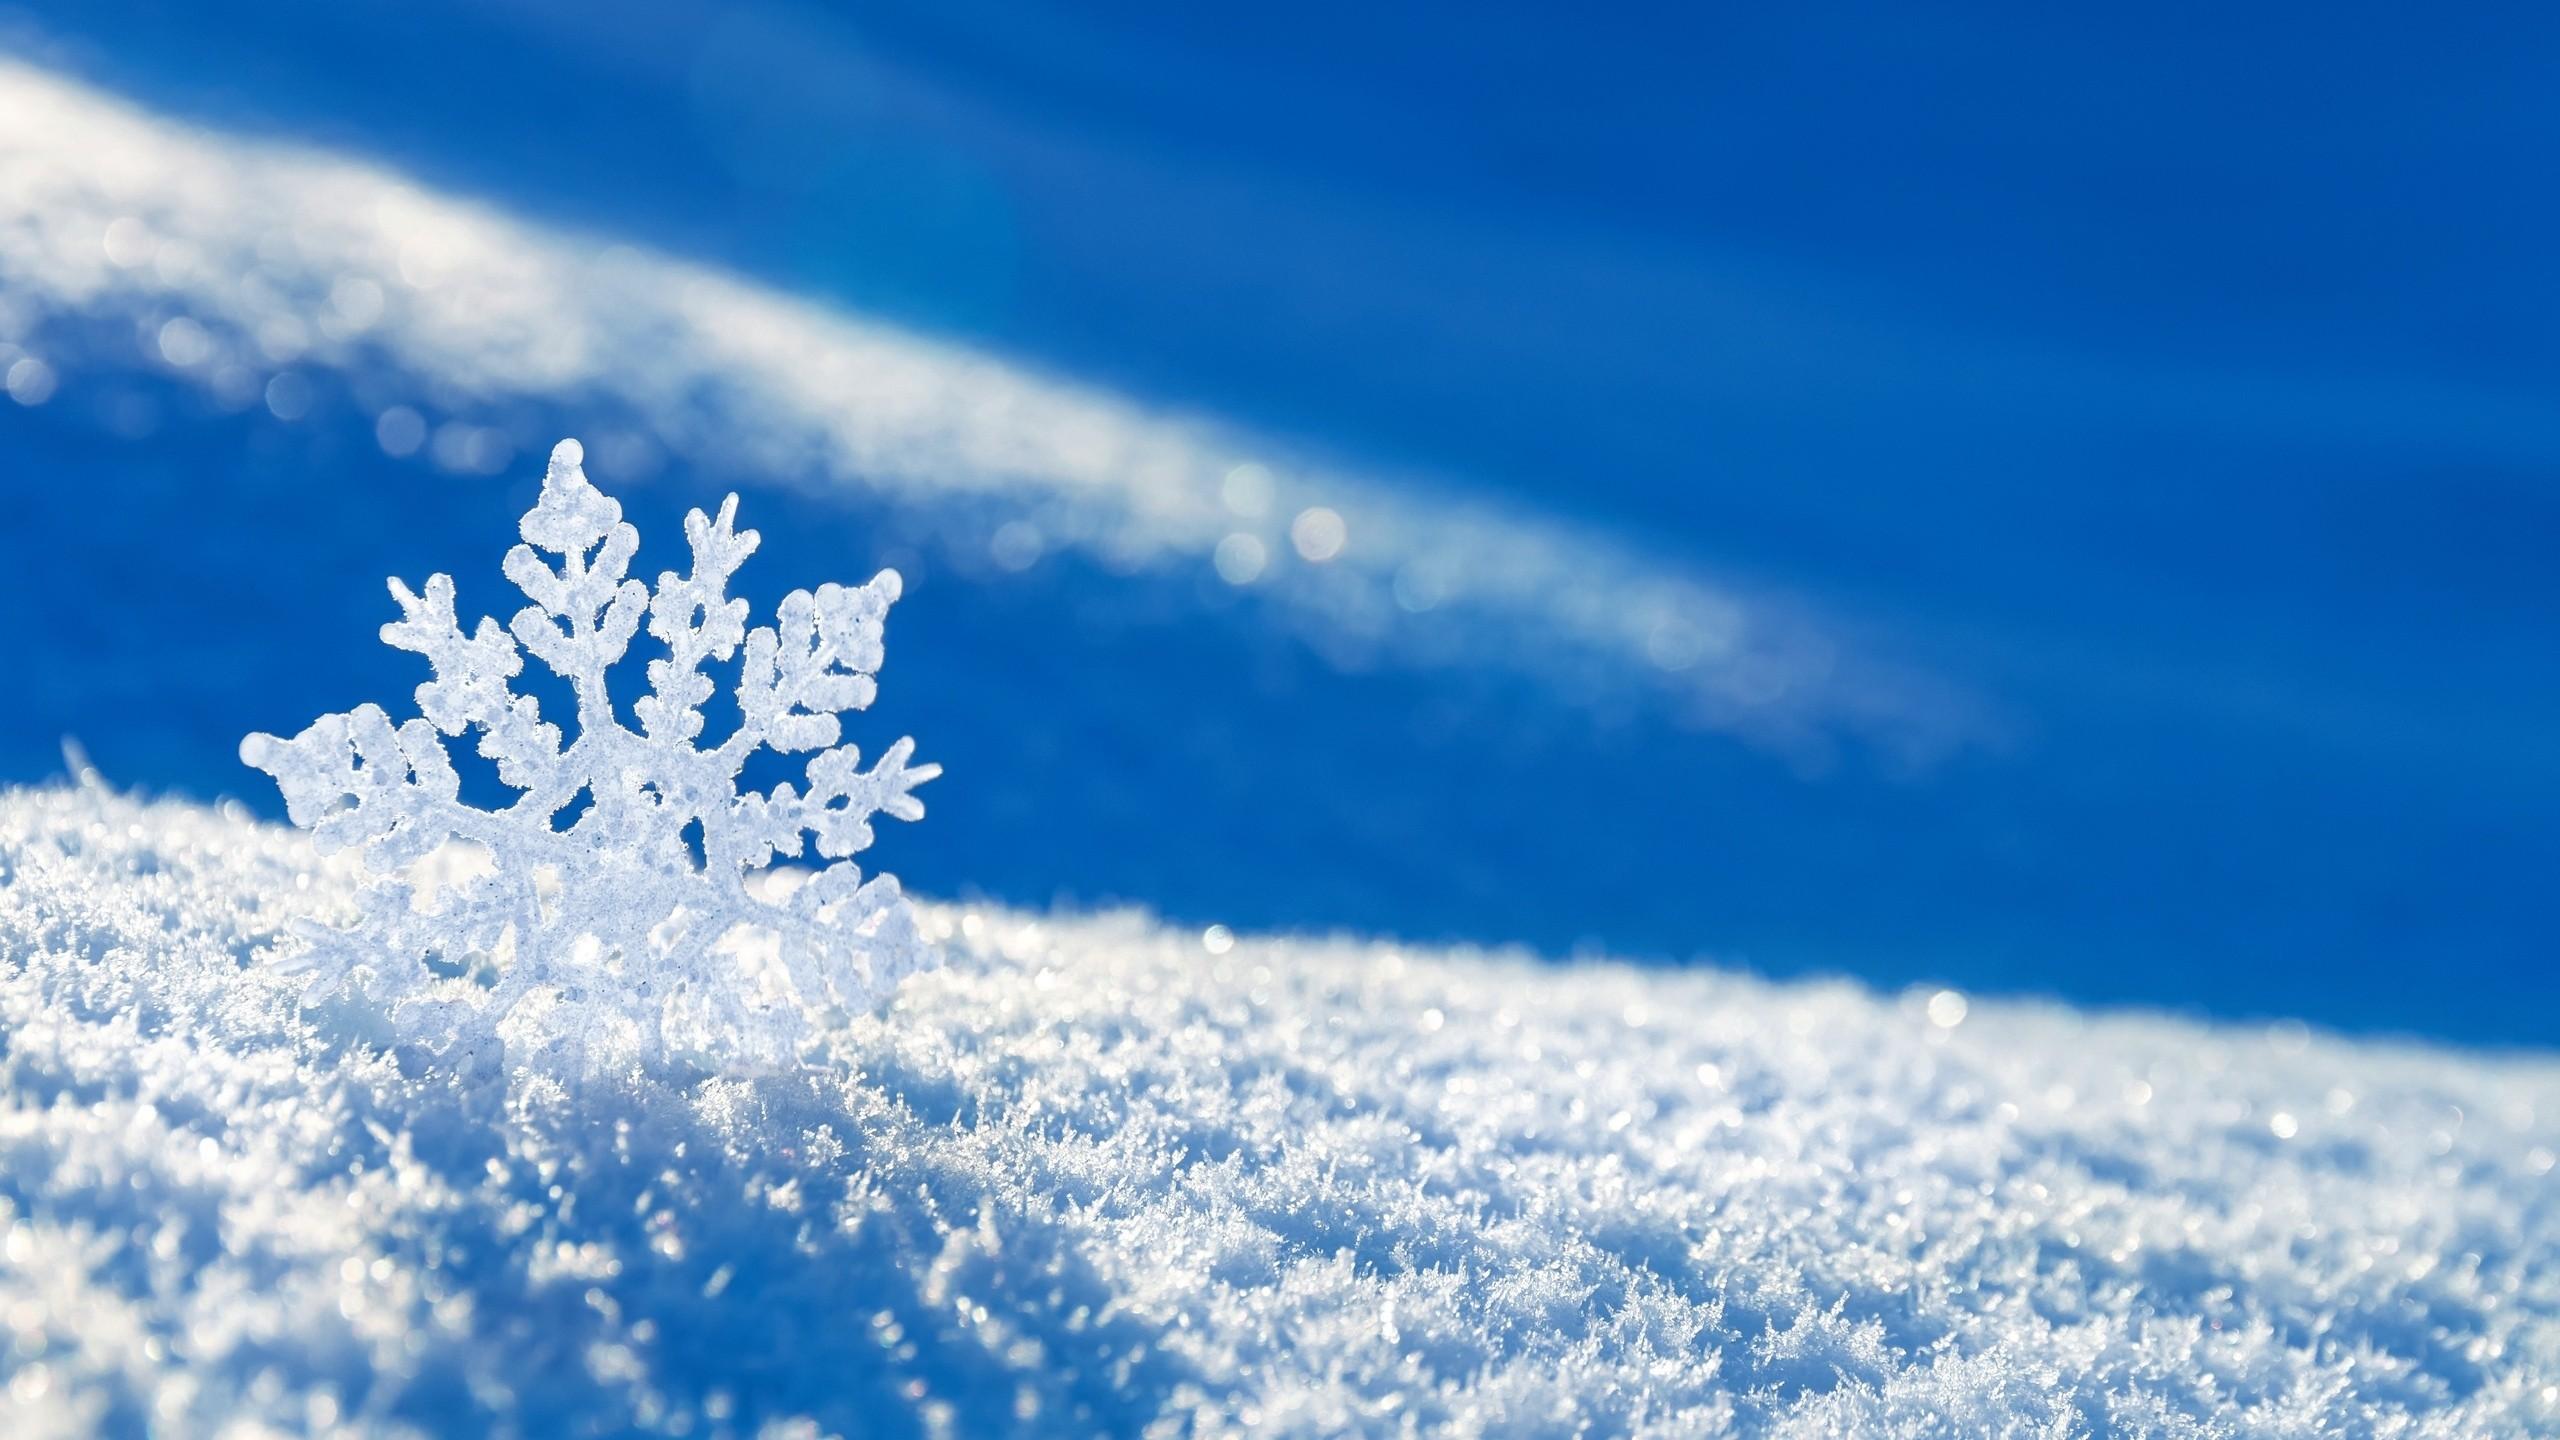 Res: 2560x1440, Snowflake Desktop Wallpapers Wallpaper